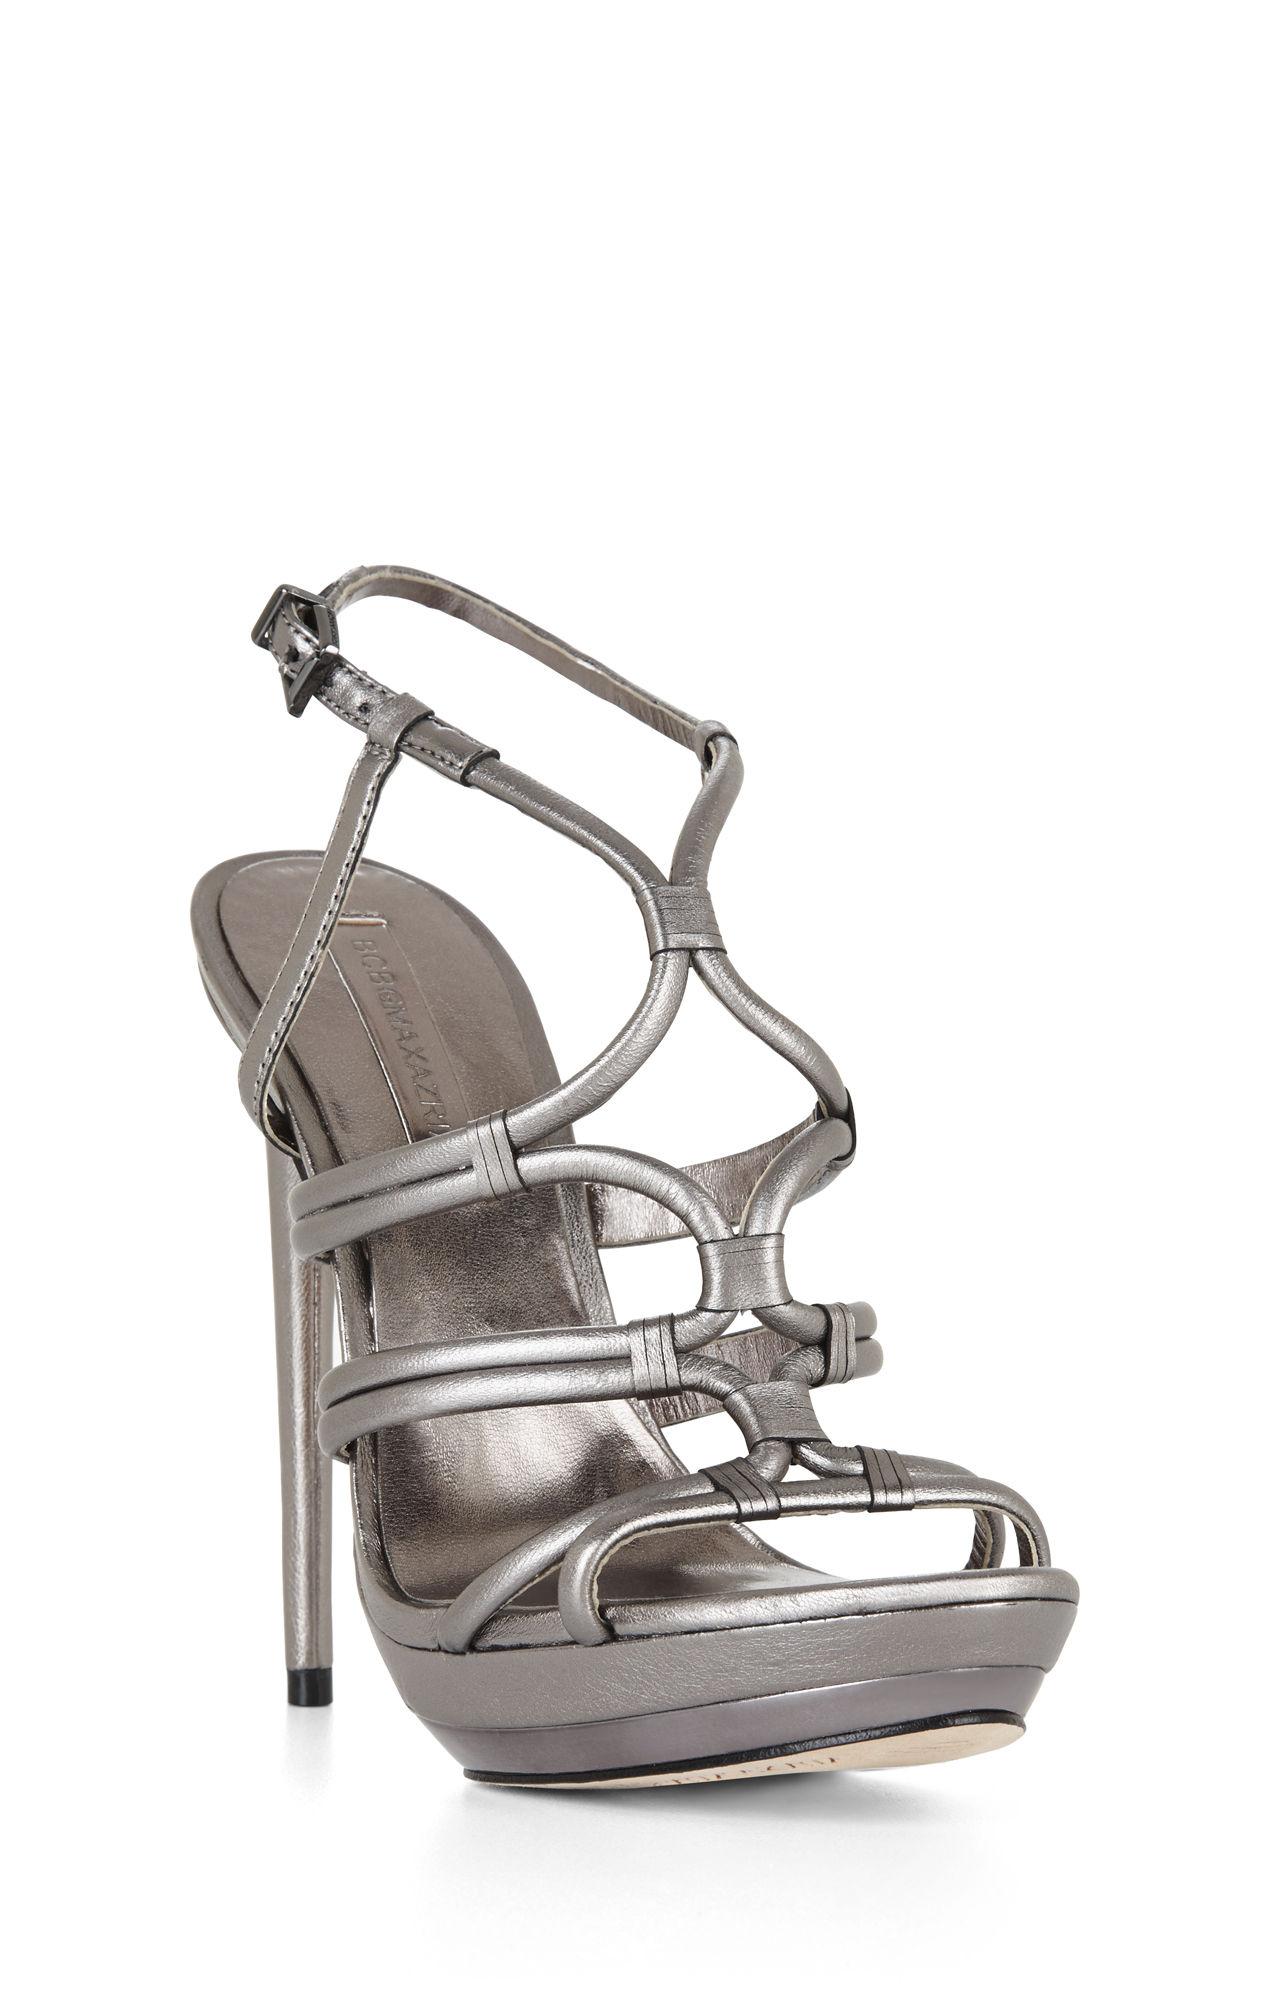 3c1022790fa8 Lyst - BCBGMAXAZRIA Farrow High-heel Strappy Dress Sandal in Gray